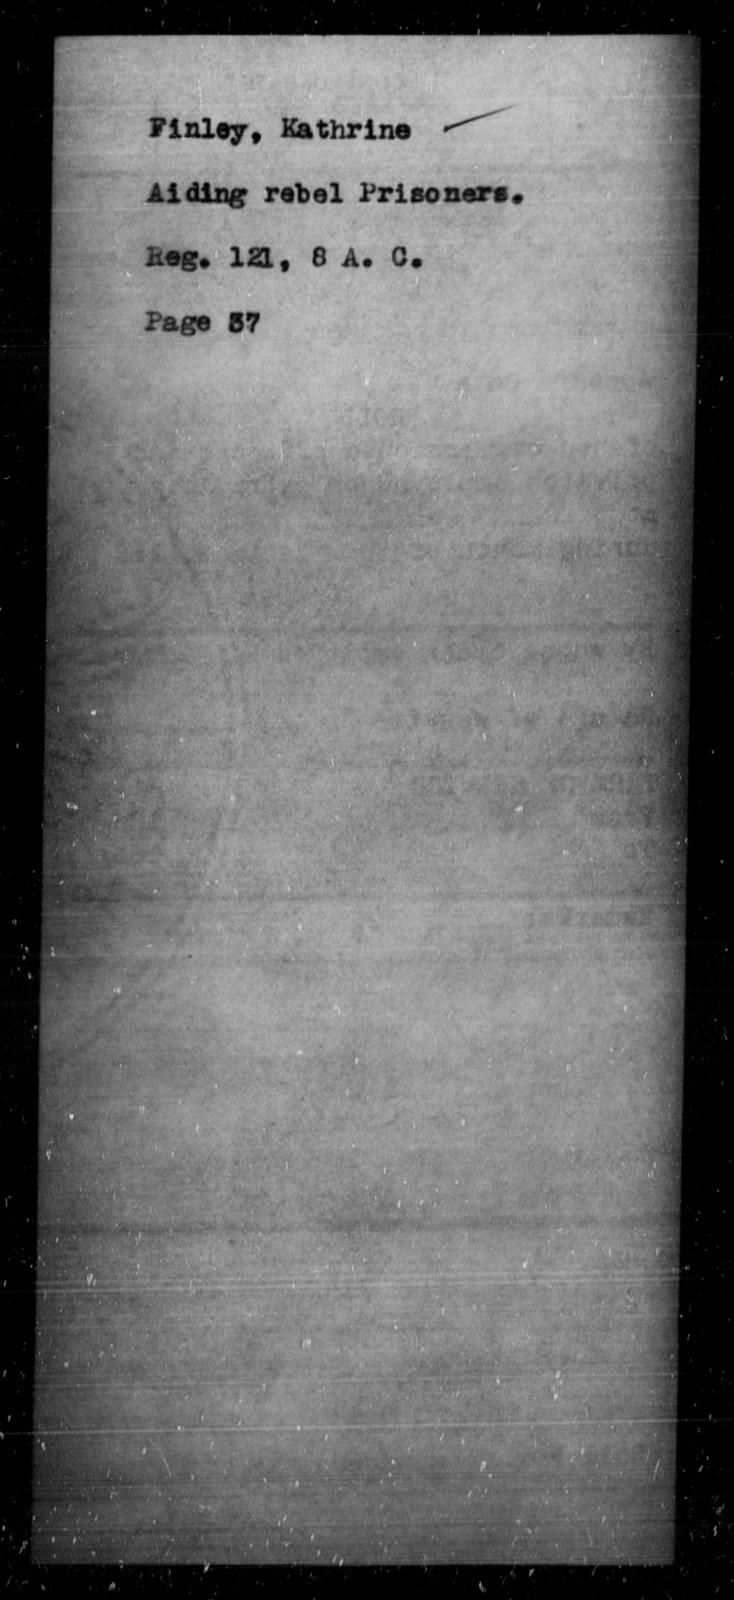 Finley, Kathrine - State: [Blank] - Year: [Blank]